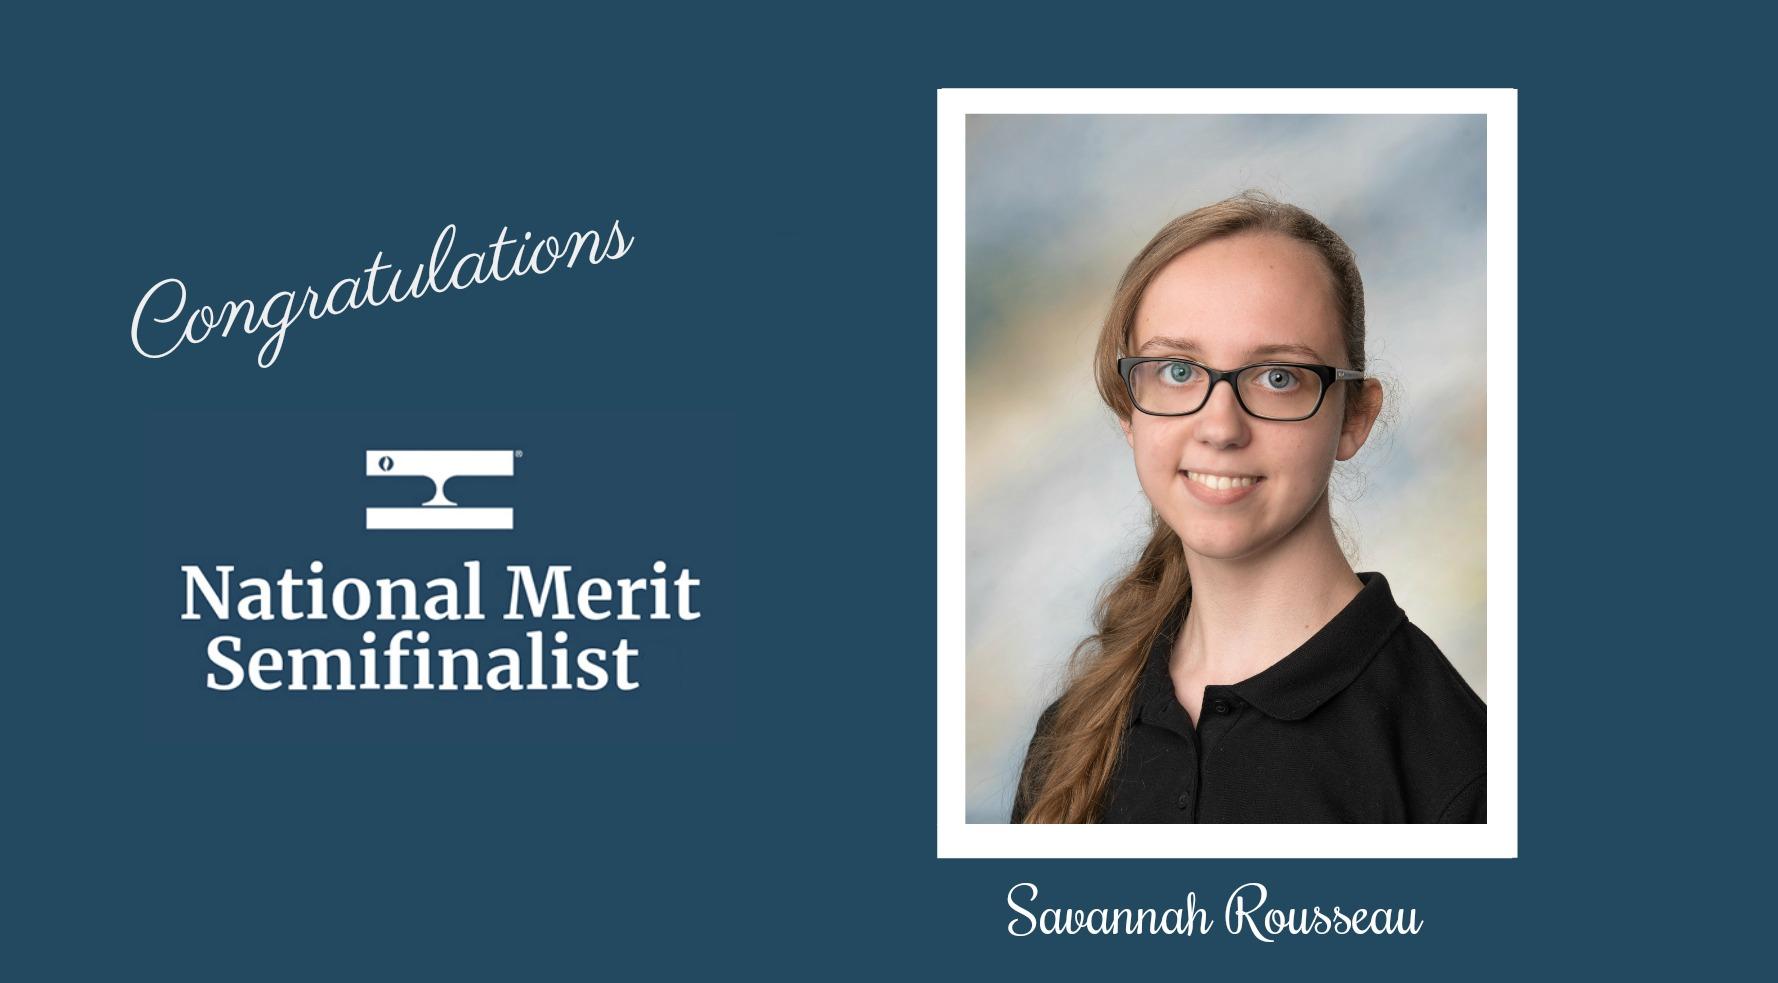 Savannah Rousseau, National Merit Semifinalist